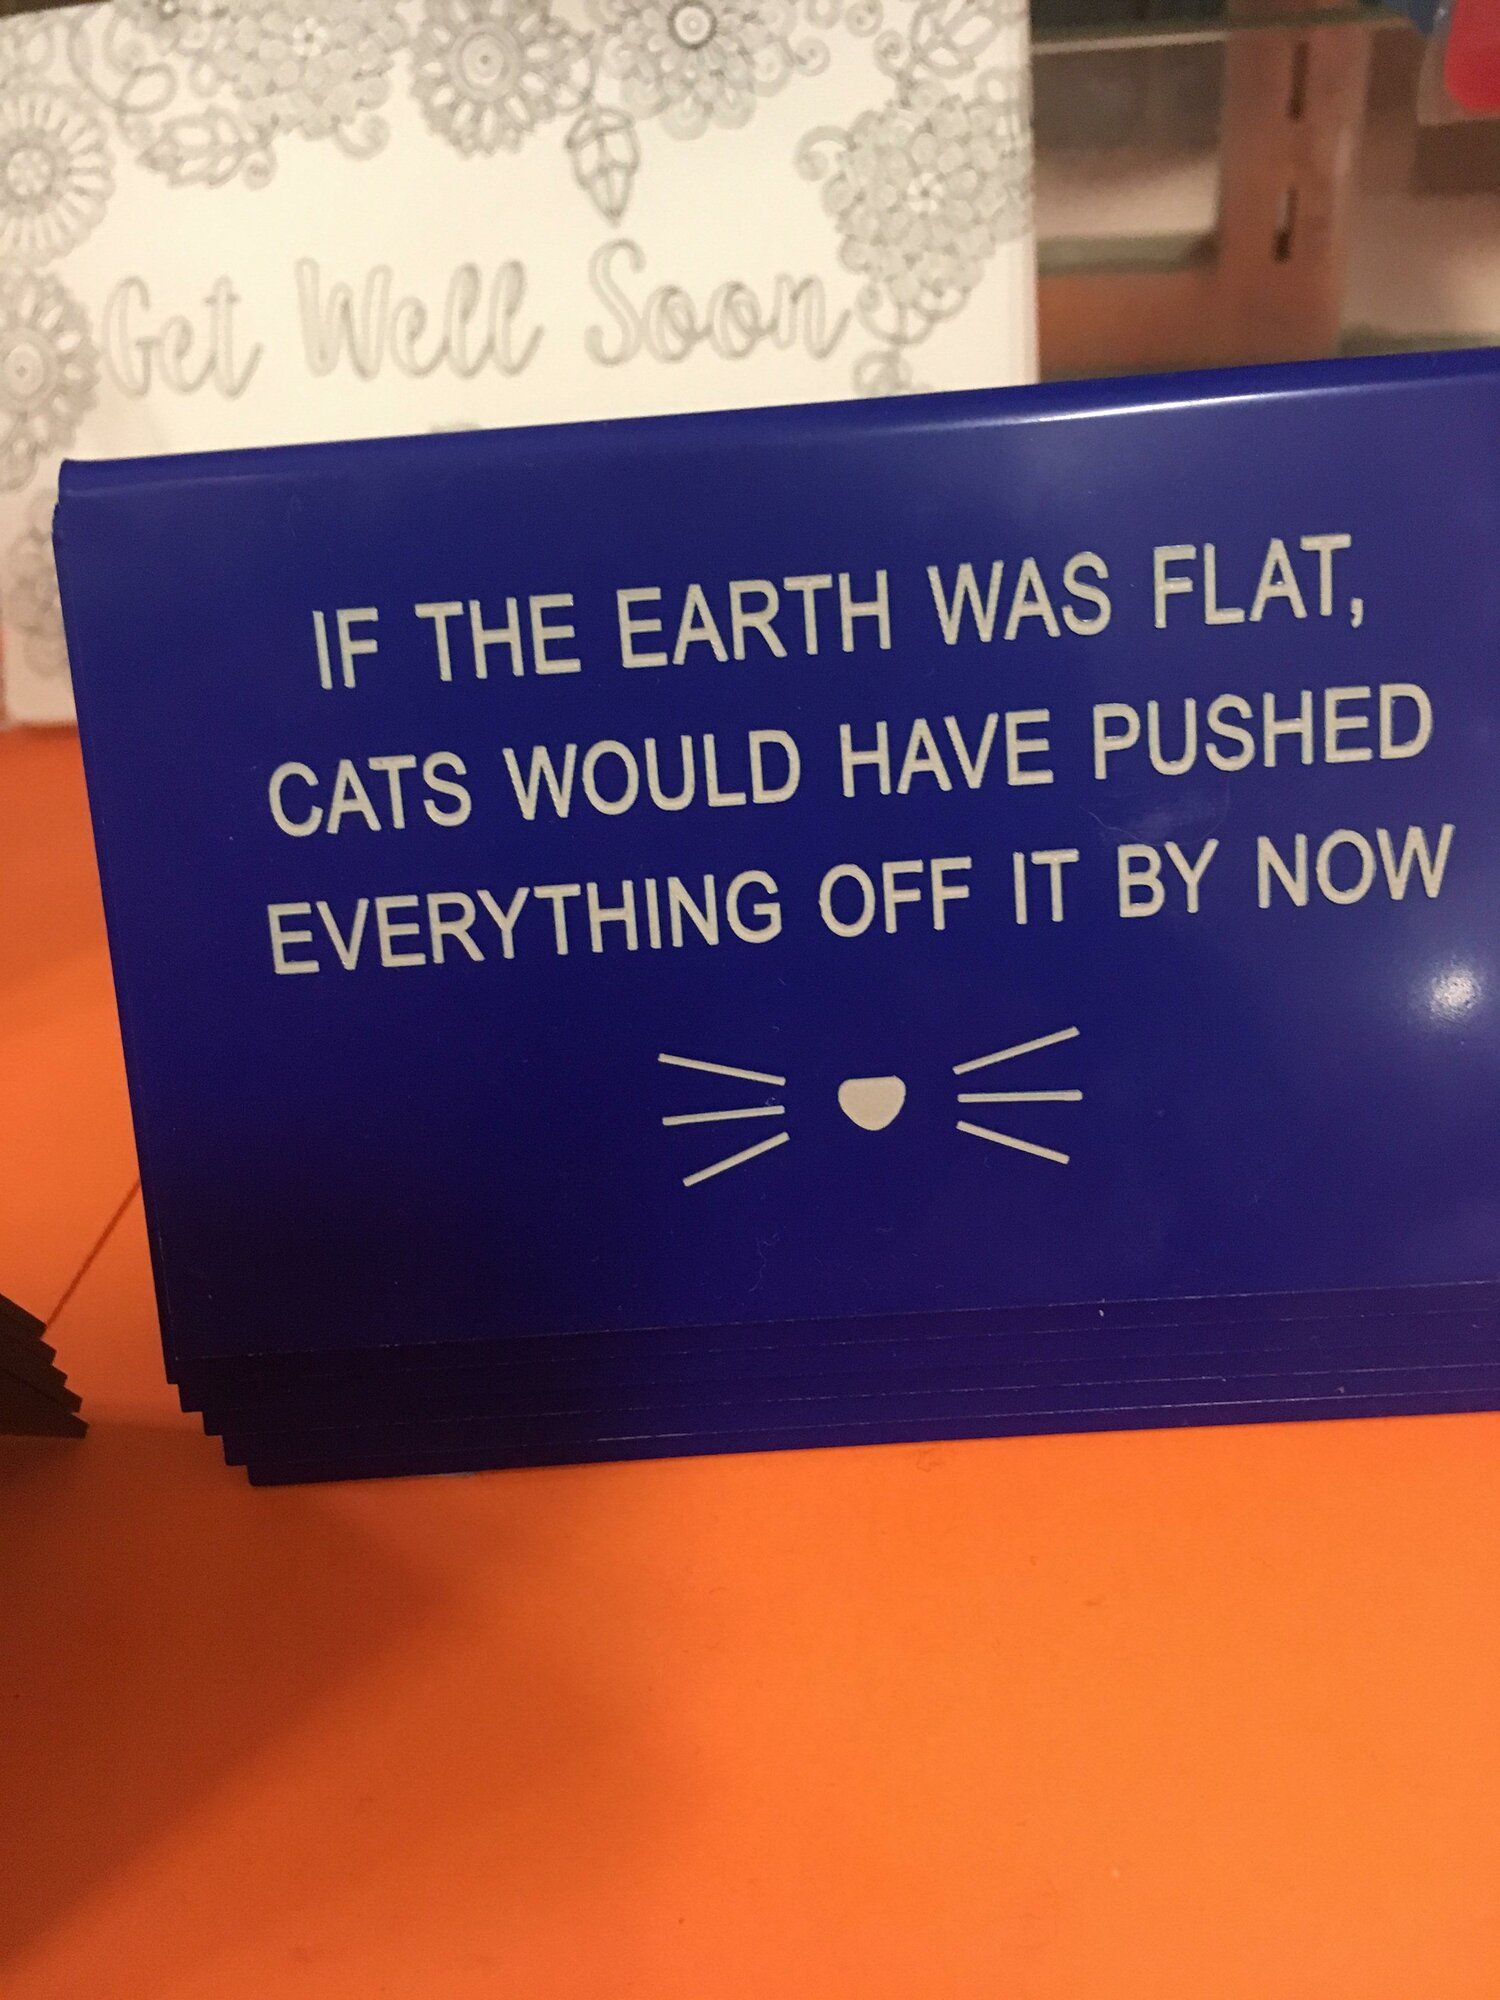 Indisputable proof! This is beyond science